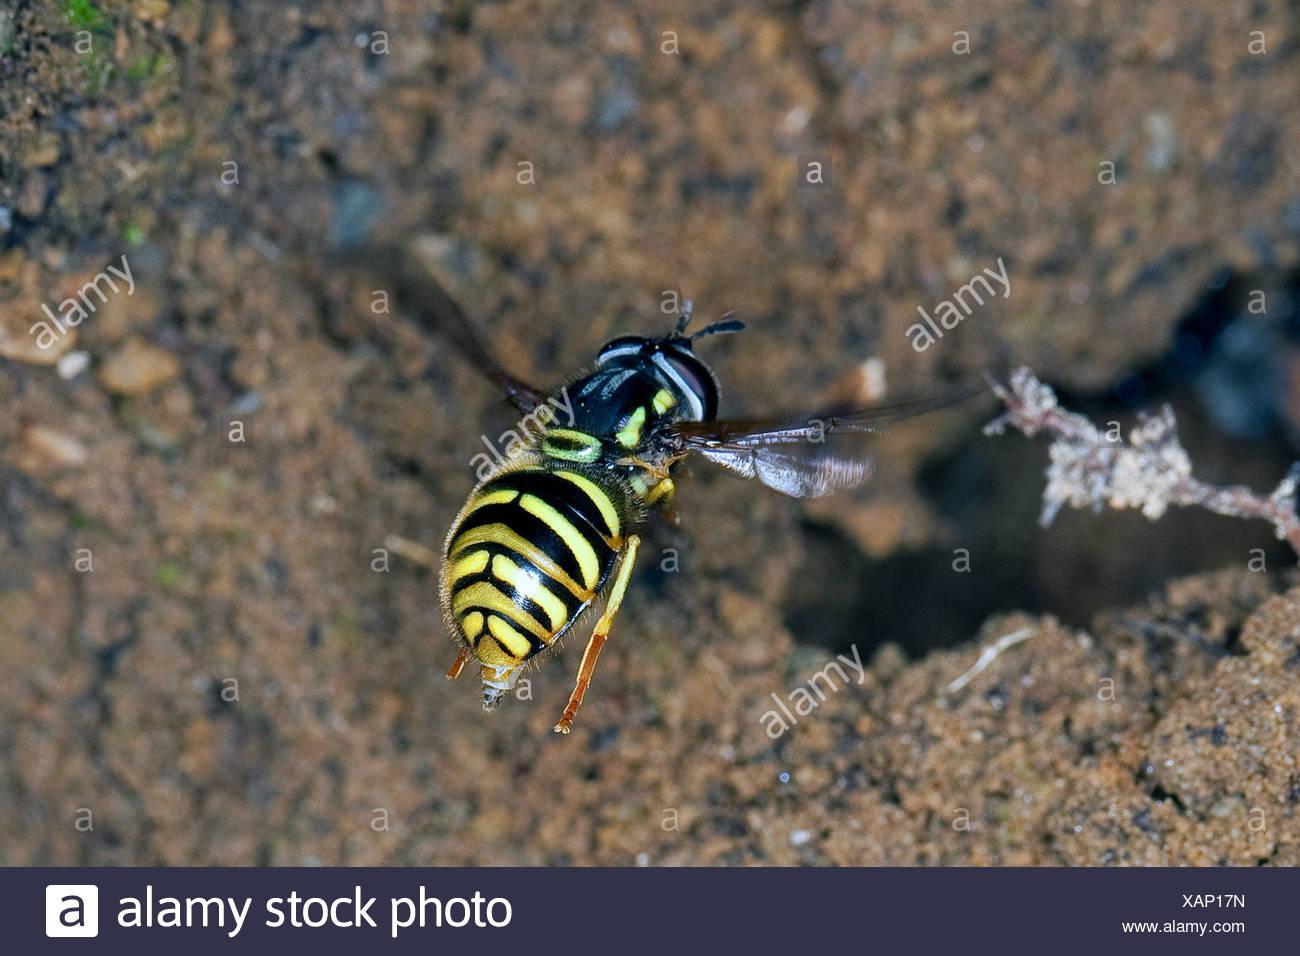 Spaete-Wespen-Schwebfliege (Chrysotoxum arcuatum, Chrysotoxum fasciatum), imitates the look of wasps for protection from enemies, Germany - Stock Image